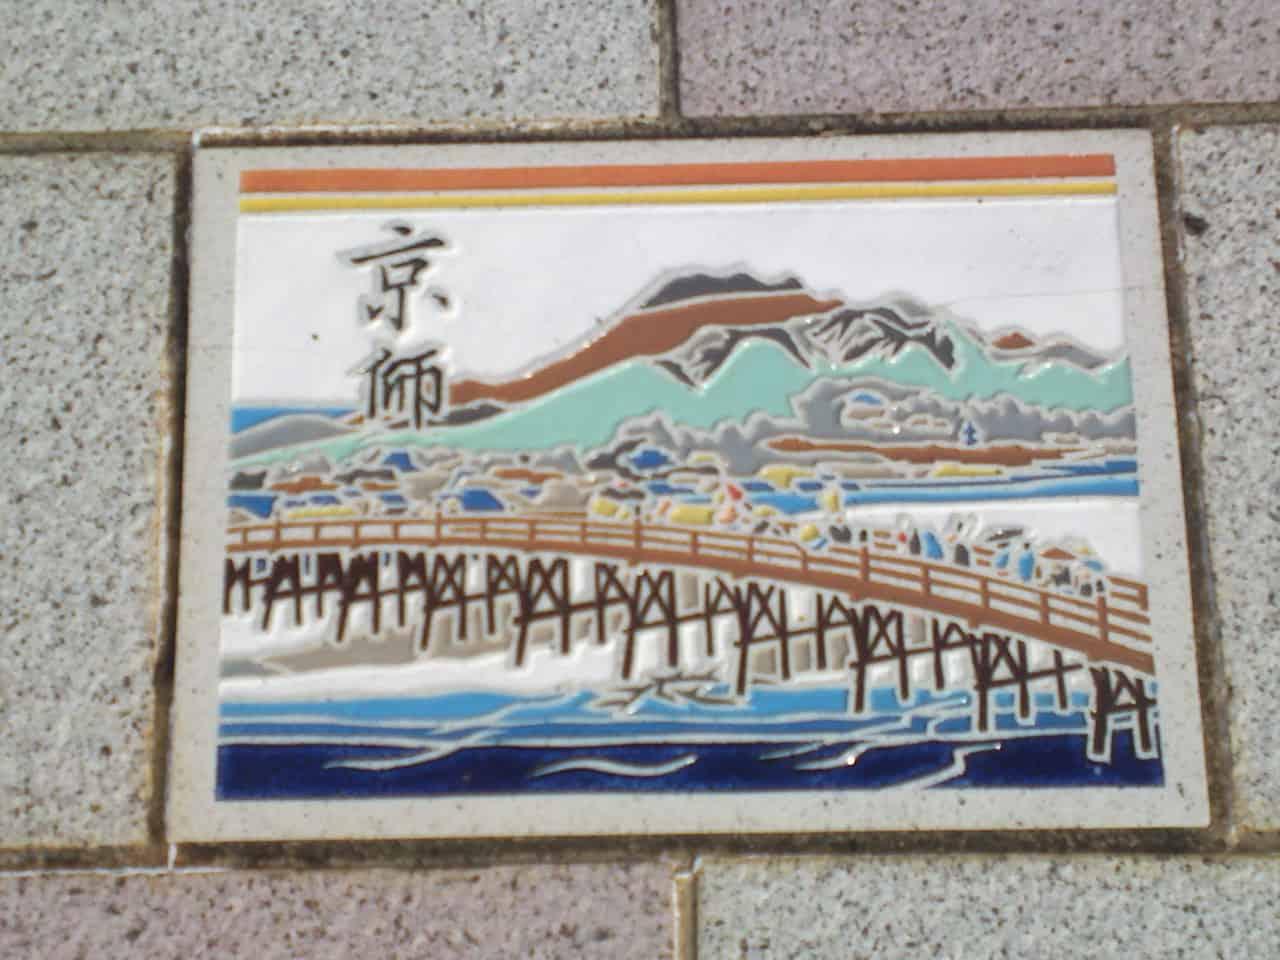 station,ukiyoe,ukiyo,e,tokaido,Tōkaidō,Utagawa,Hiroshige,Shizuoka,woodblock,painting